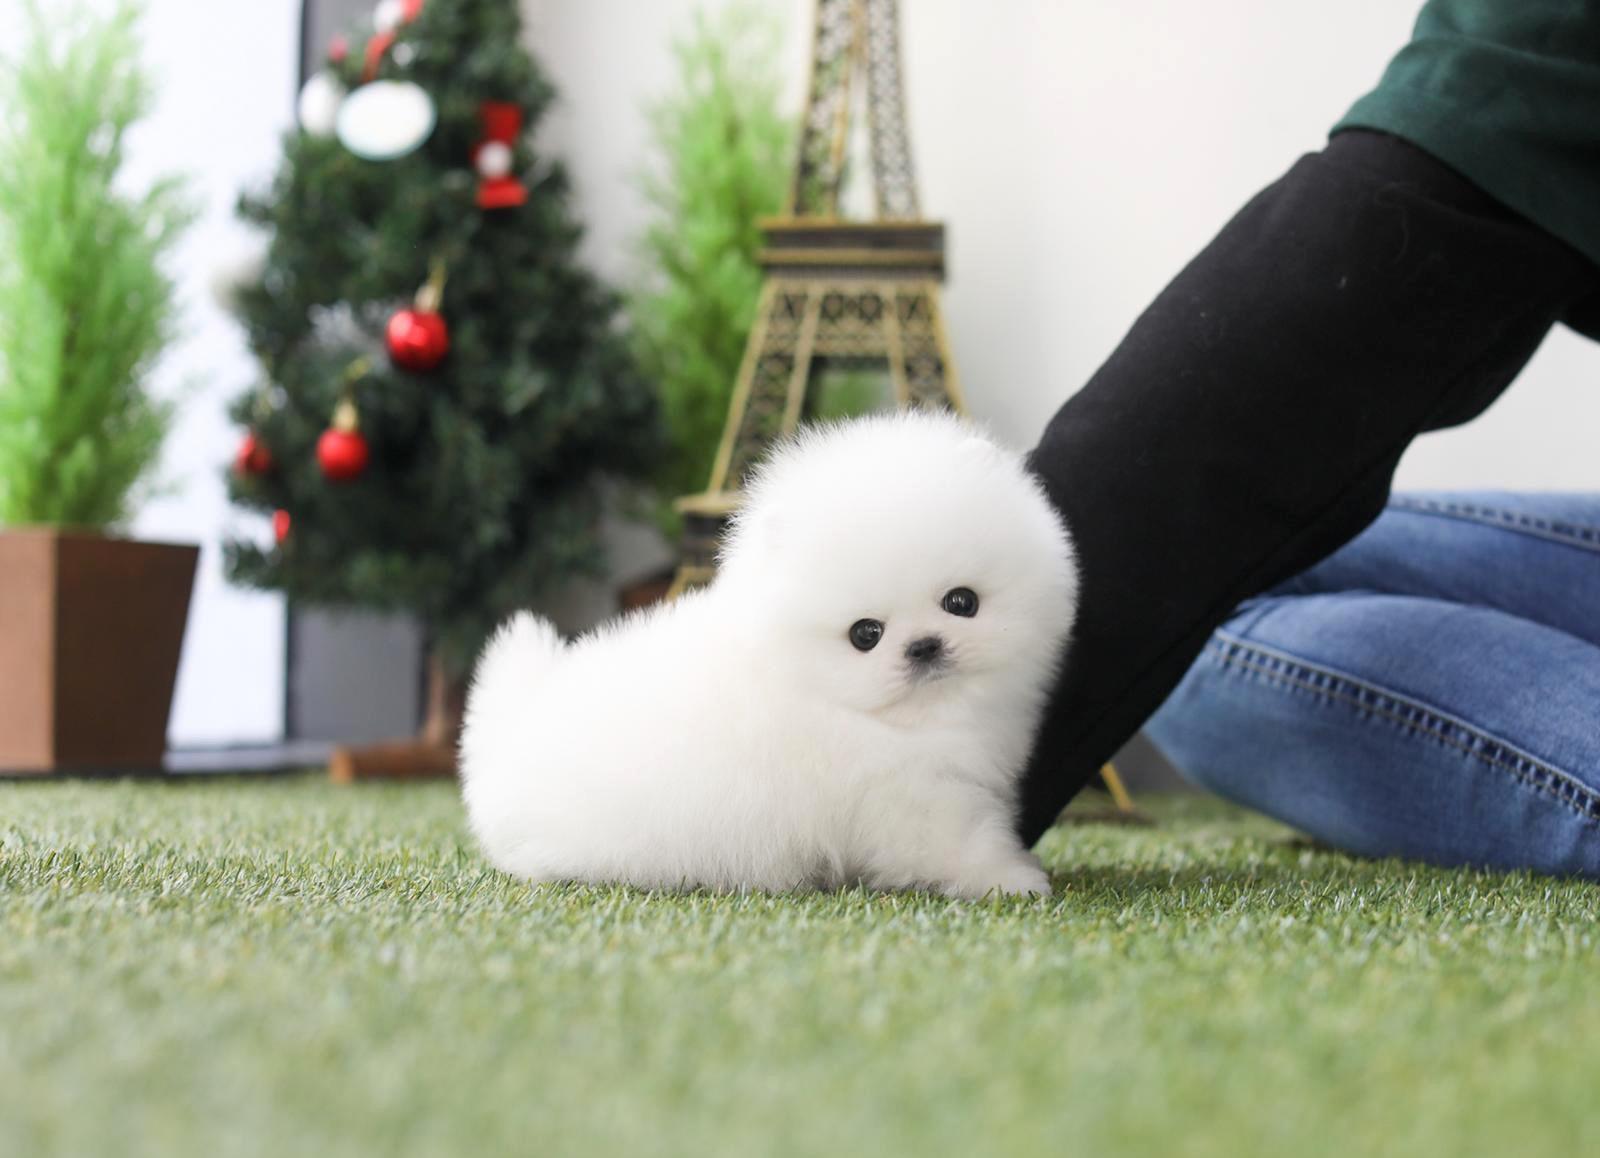 Scotch White Tiny Teacup Pomeranian - Tiny Teacup Pups - photo#24